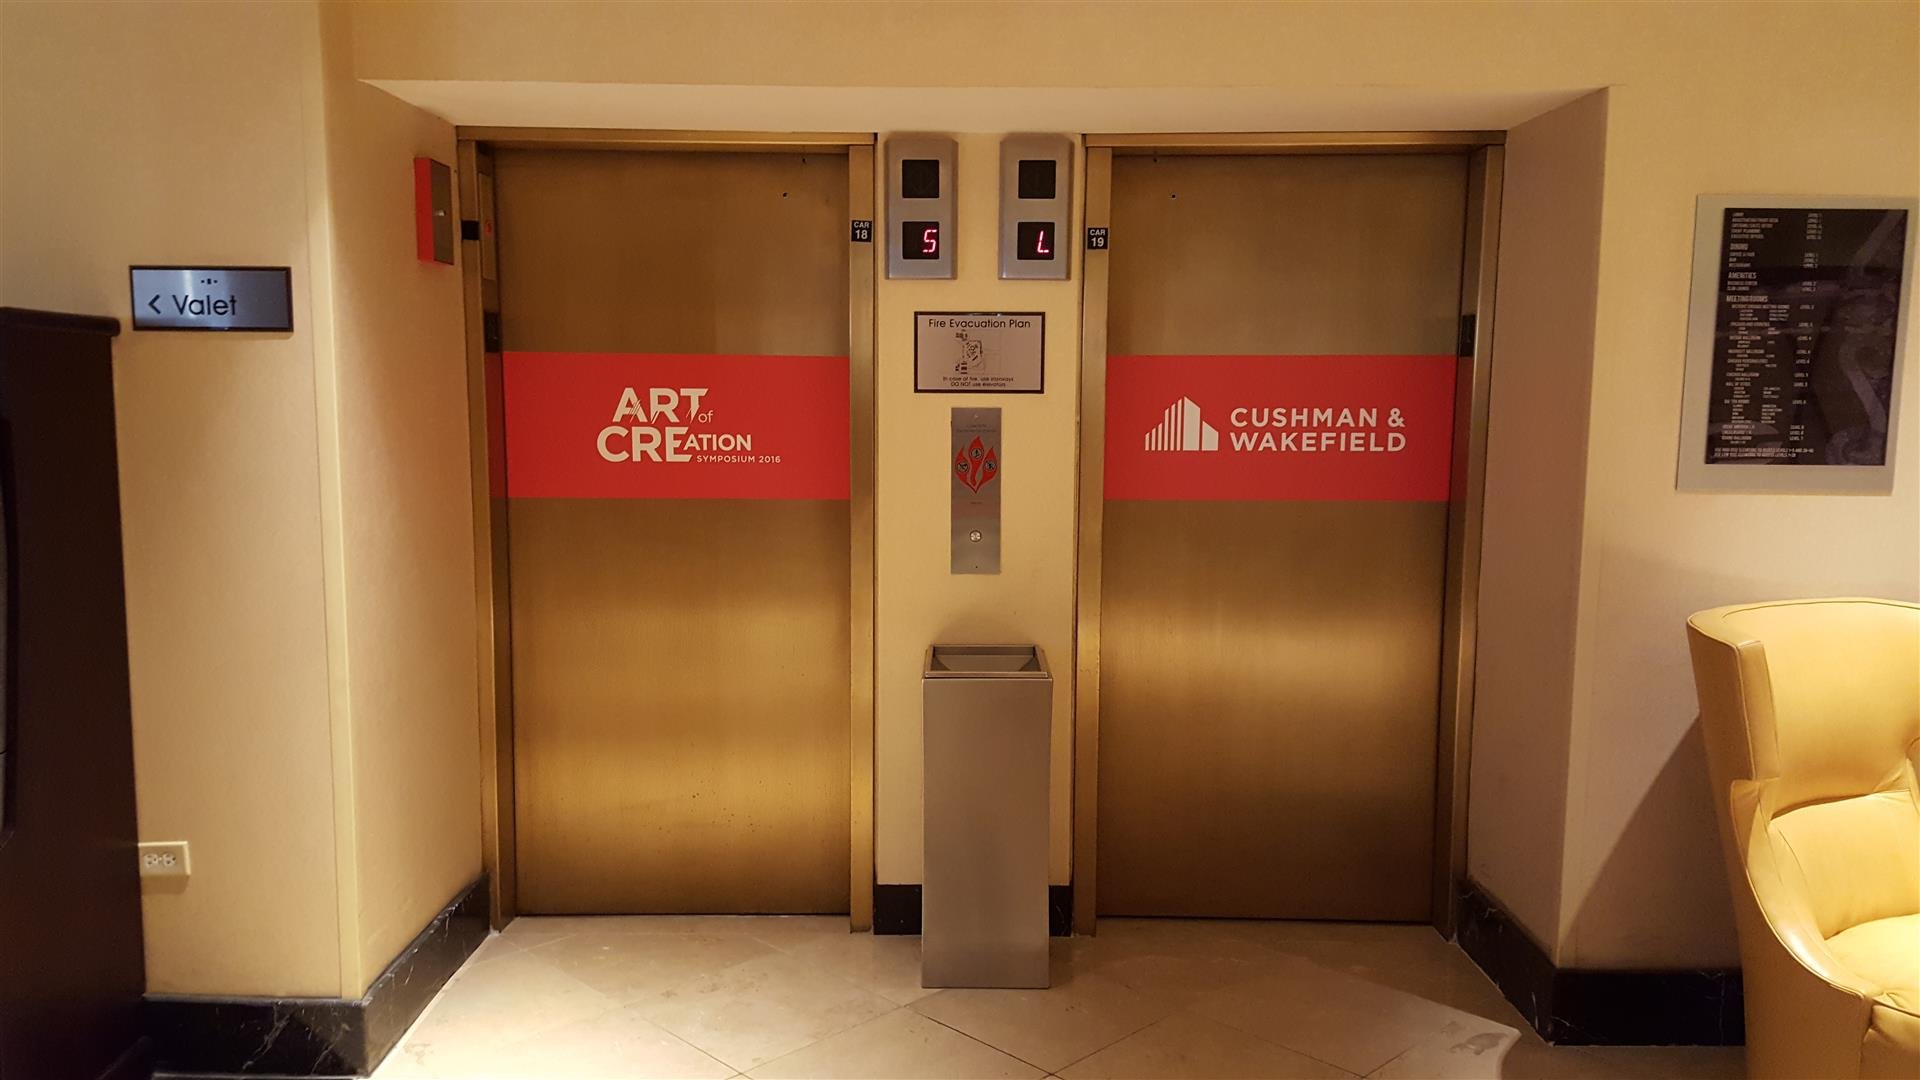 Art of Creation Elevator Wrap